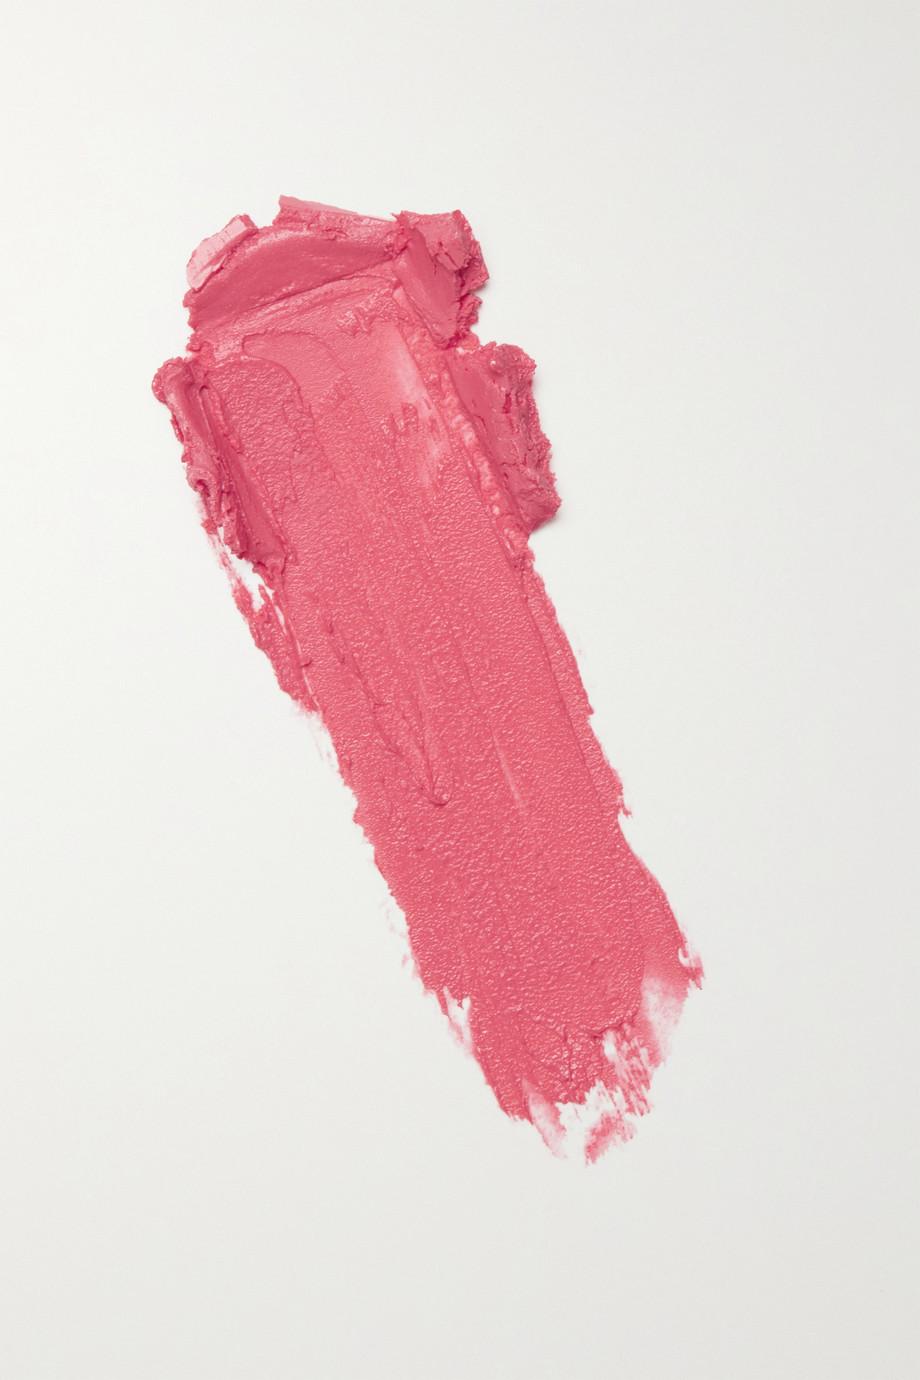 Kjaer Weis Recharge de baume à lèvres teinté, Bliss Full